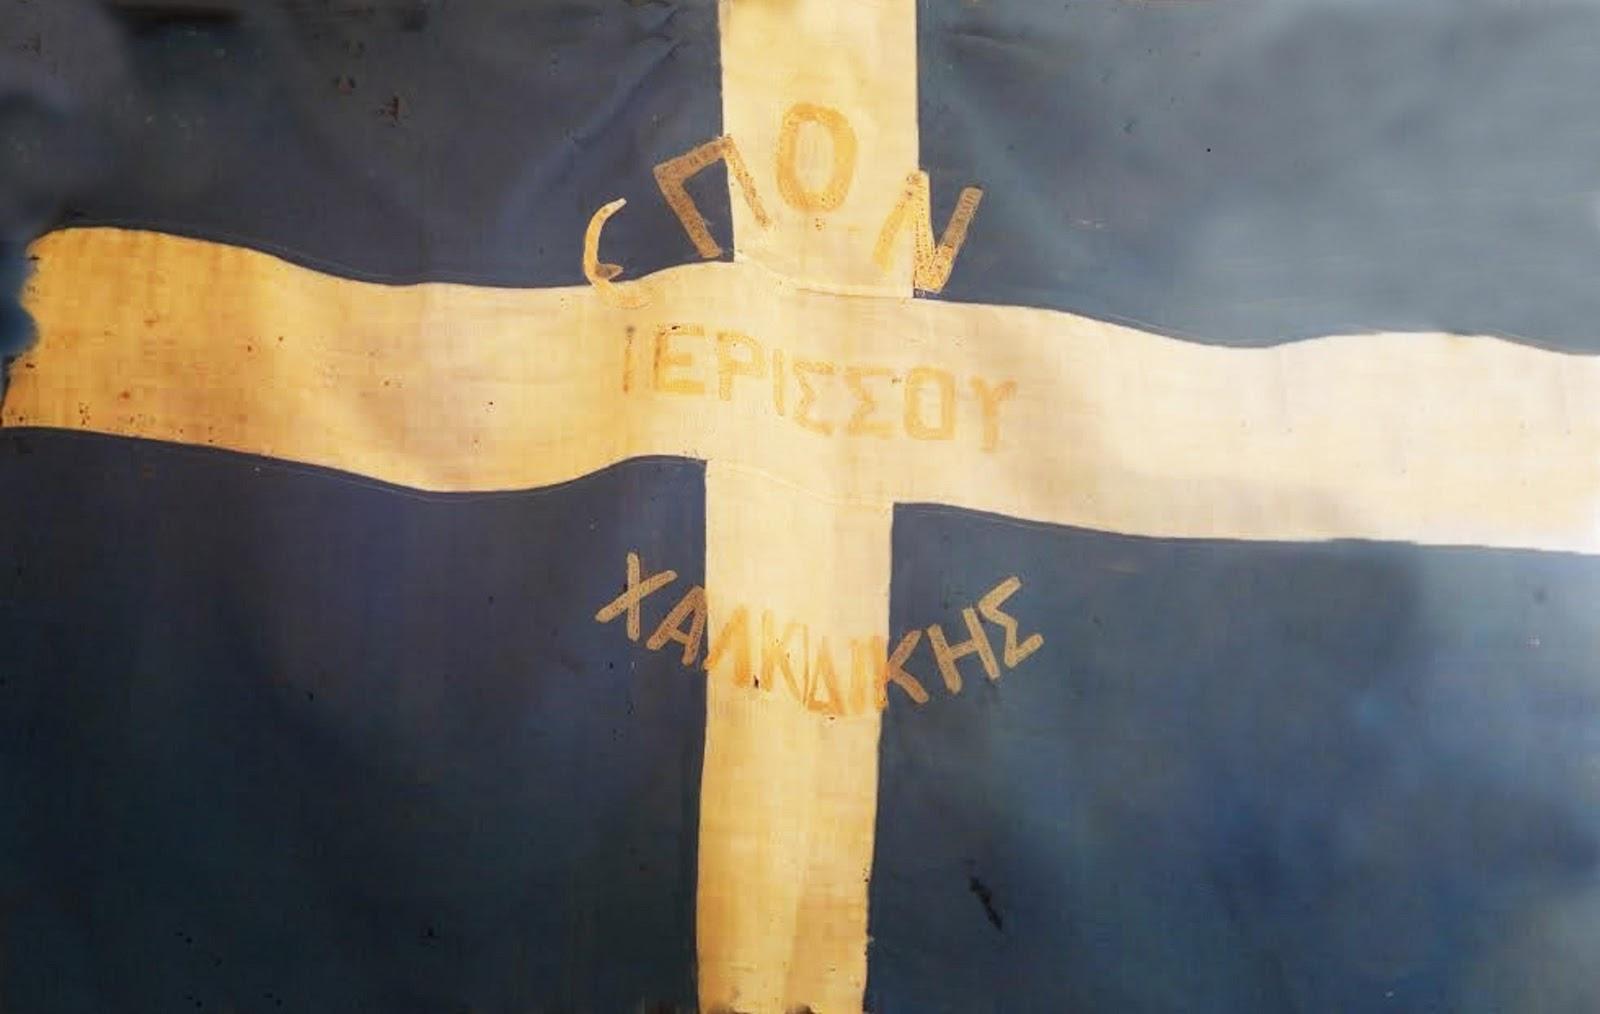 Lexar:ΕΛΑΝ ΜΙΚΡΕΣ ΦΩΤ:ΕΠΟΝ Σημαία:ΕΠΟΝ ΙΕΡΙΣΣΟΥ δ.jpg